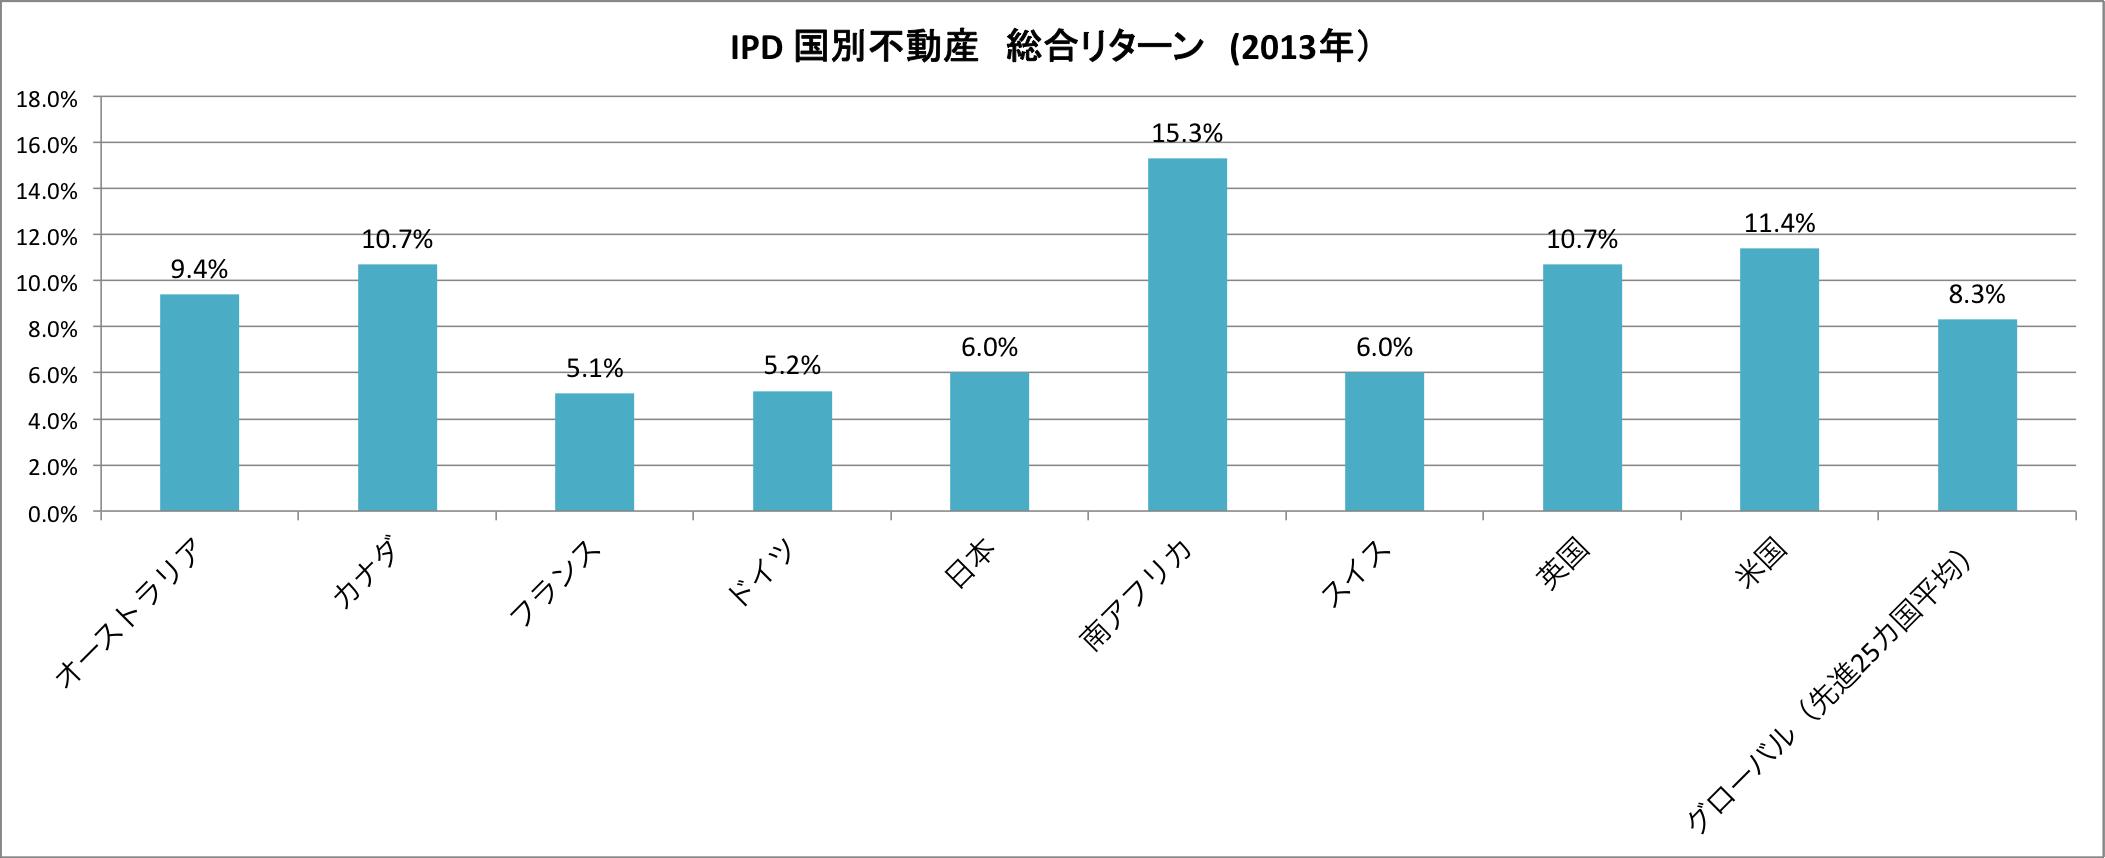 IPD 国別不動産 総合リターン (2013年)